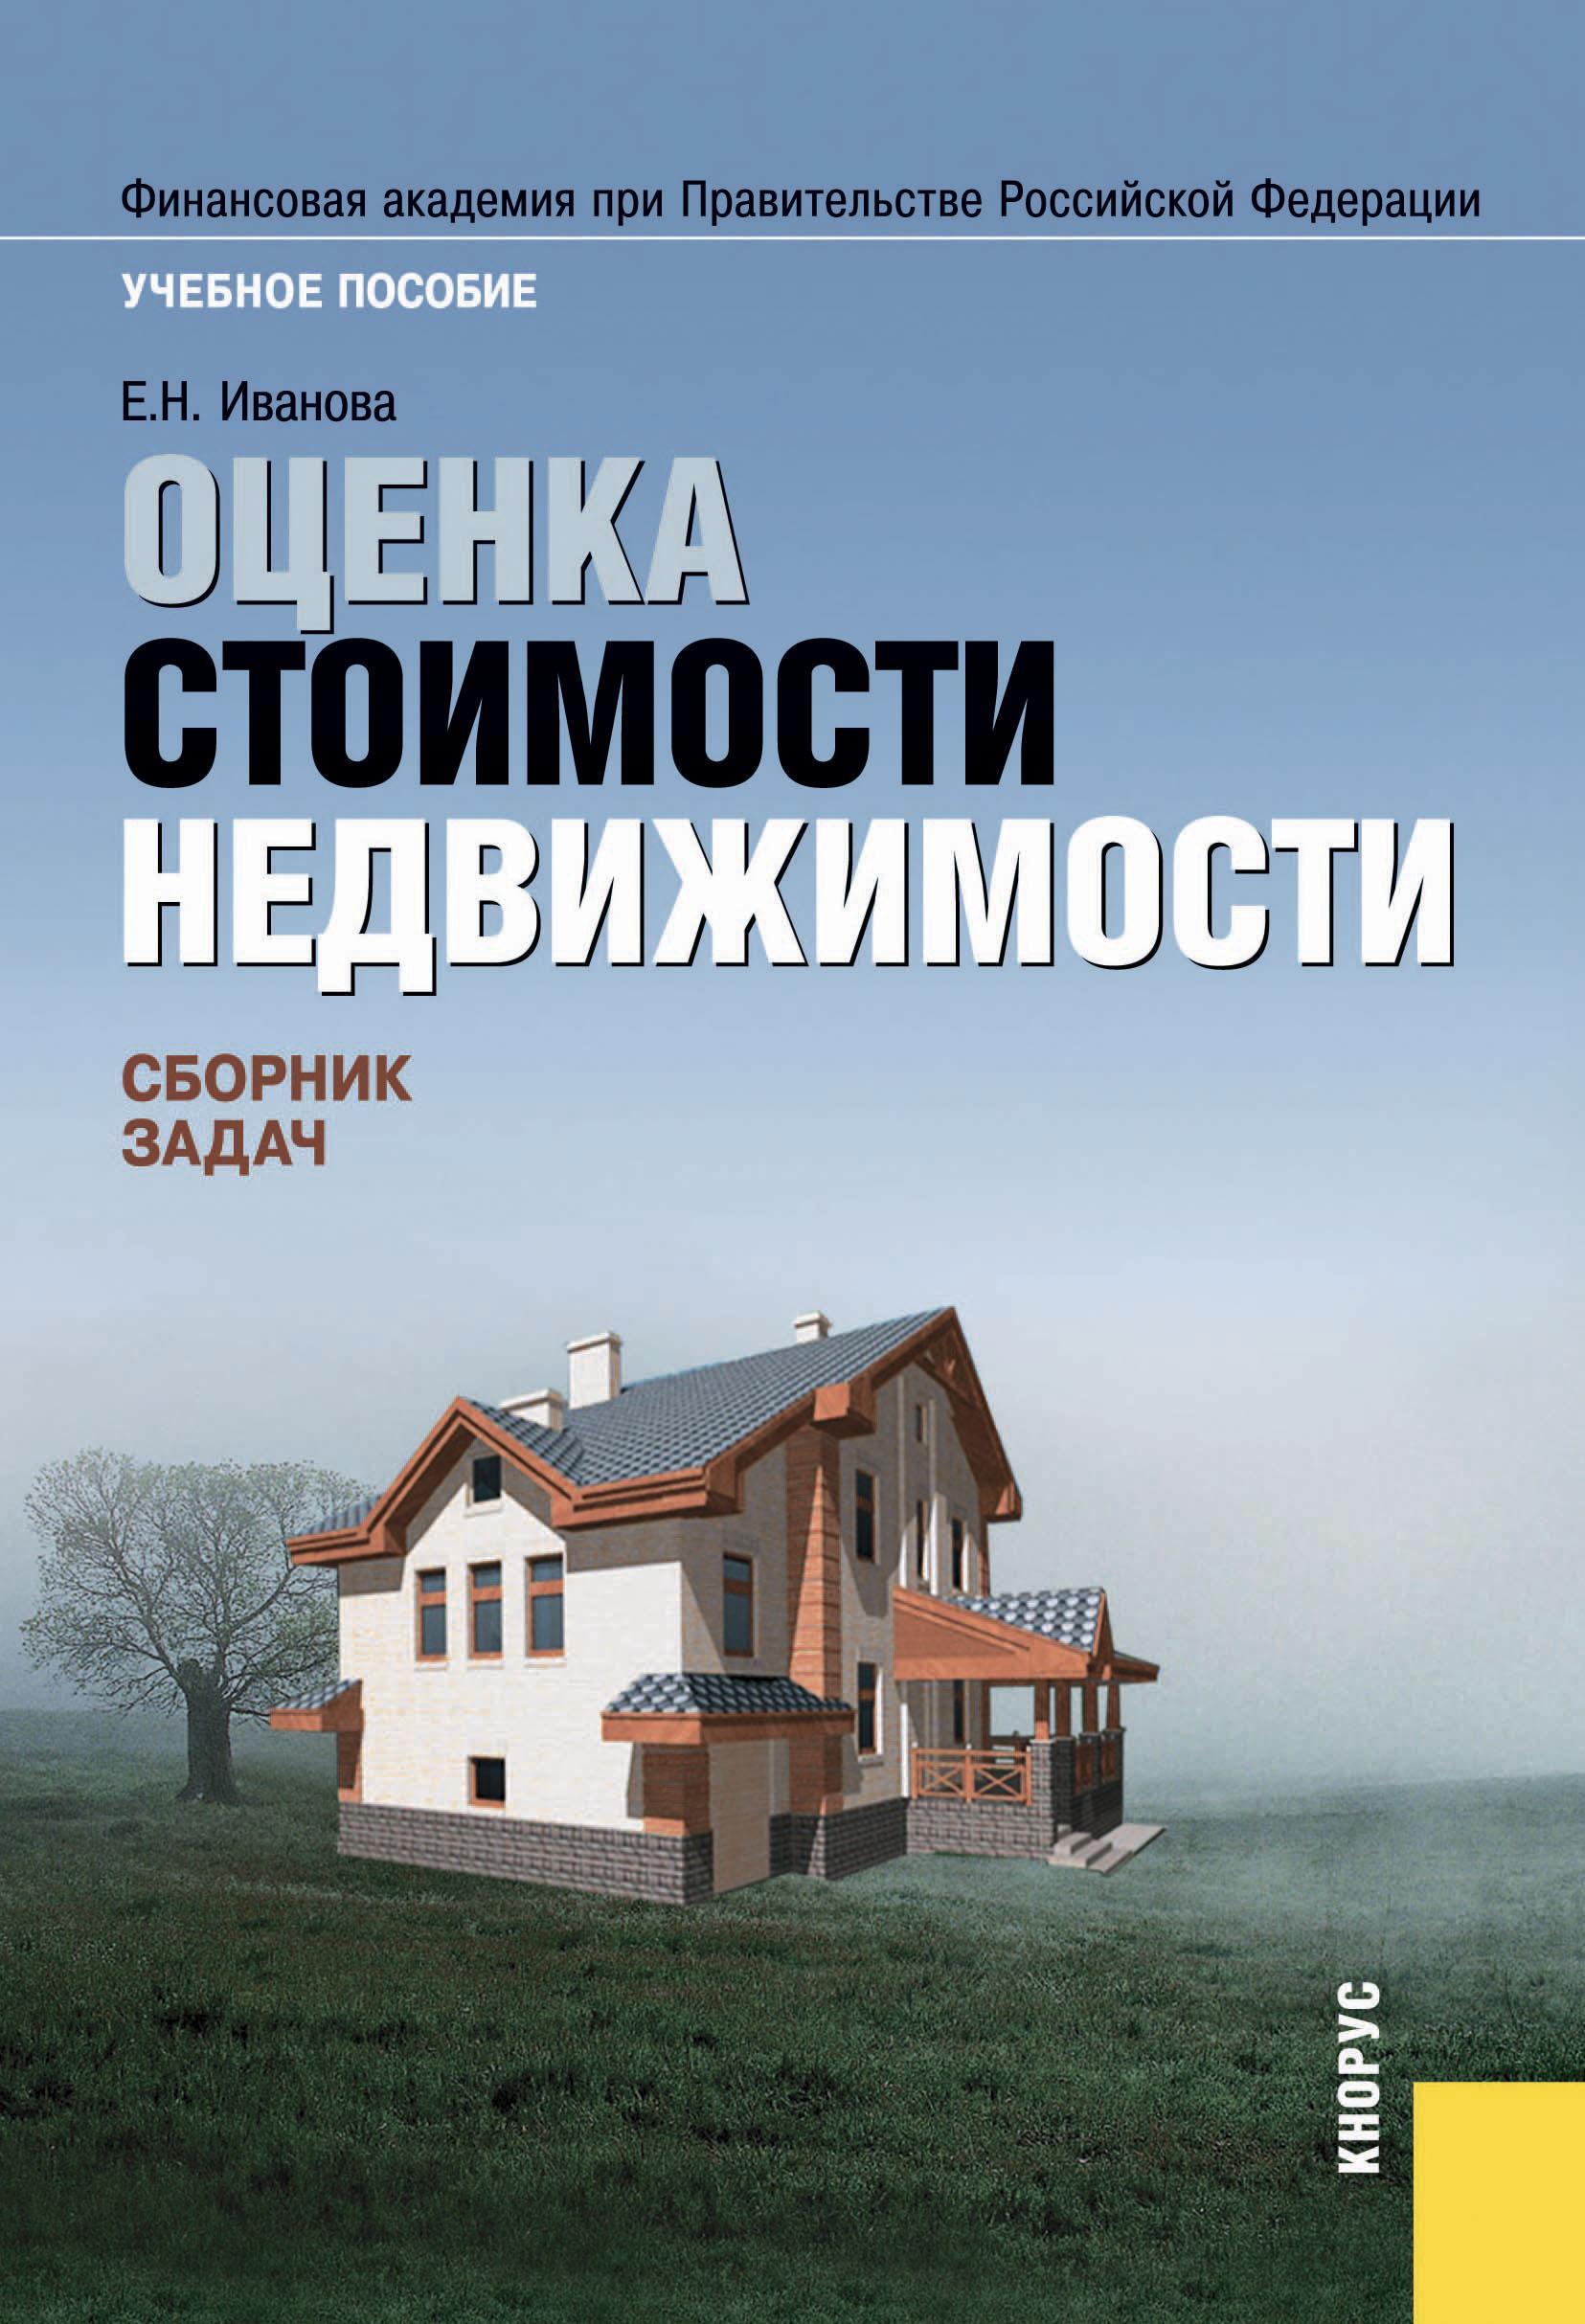 цена на Елена Иванова Оценка стоимости недвижимости. Сборник задач